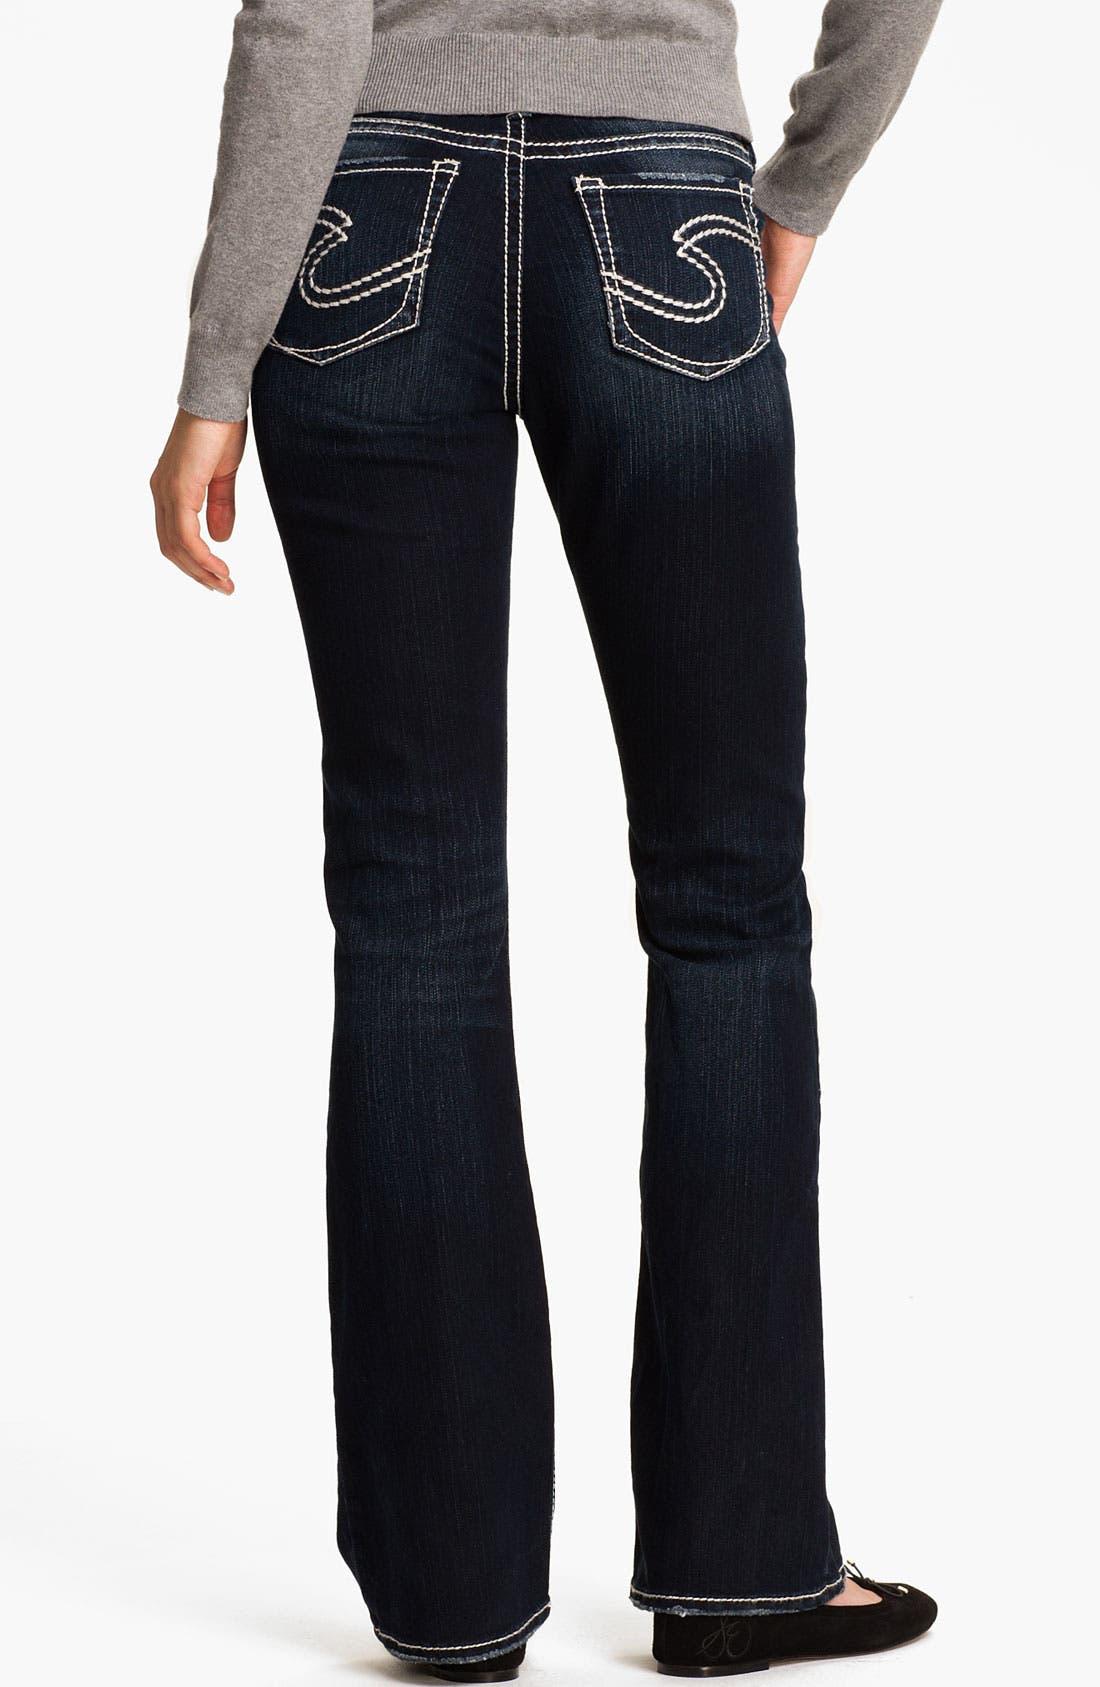 Main Image - Silver Jeans Co. 'Natsuki' Bootcut Jeans (Juniors)